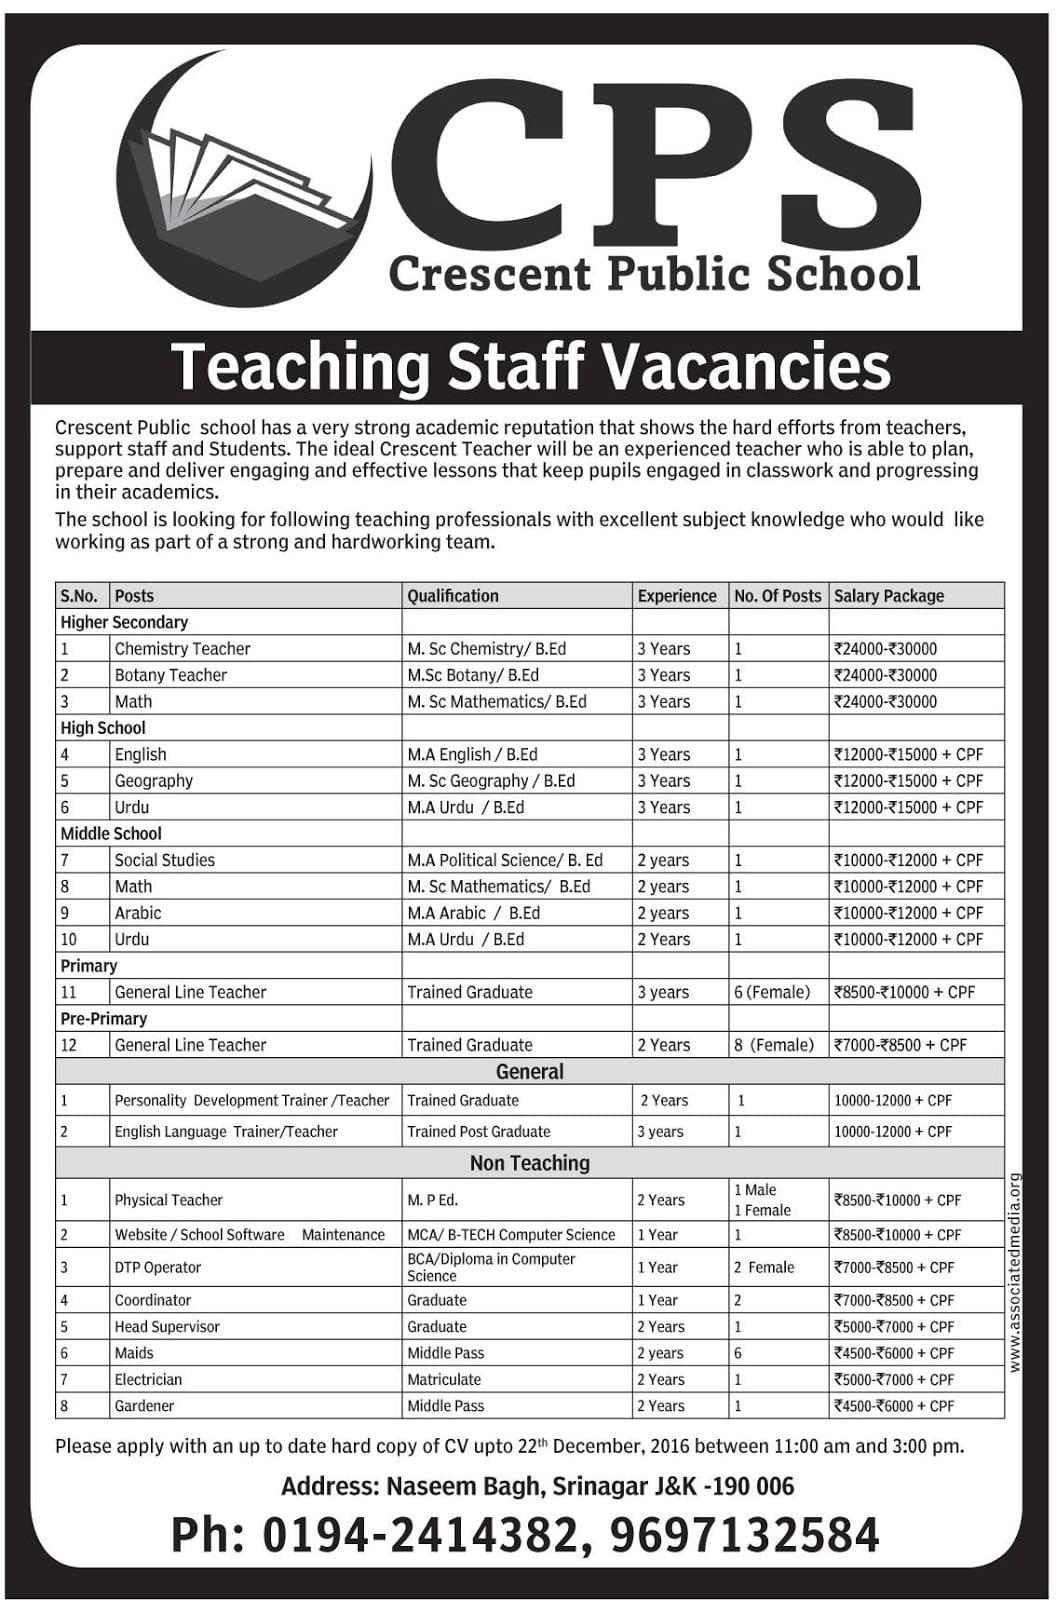 Crescent Public School has teaching staff vacancies